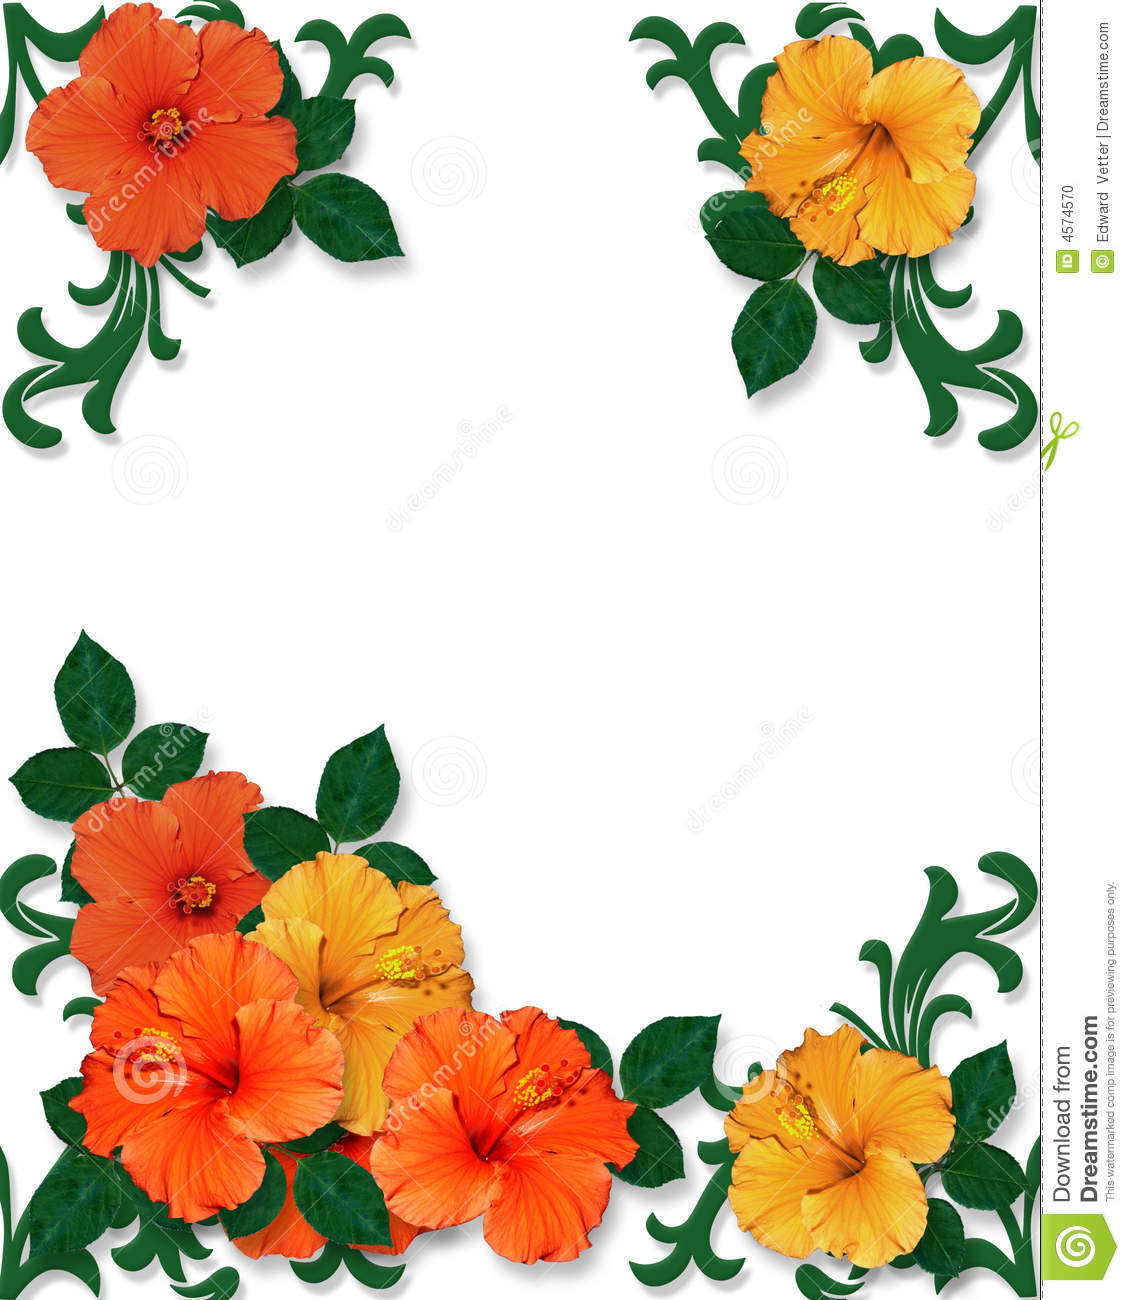 Free Printable Hawaiian Borders | Free download on ClipArtMag